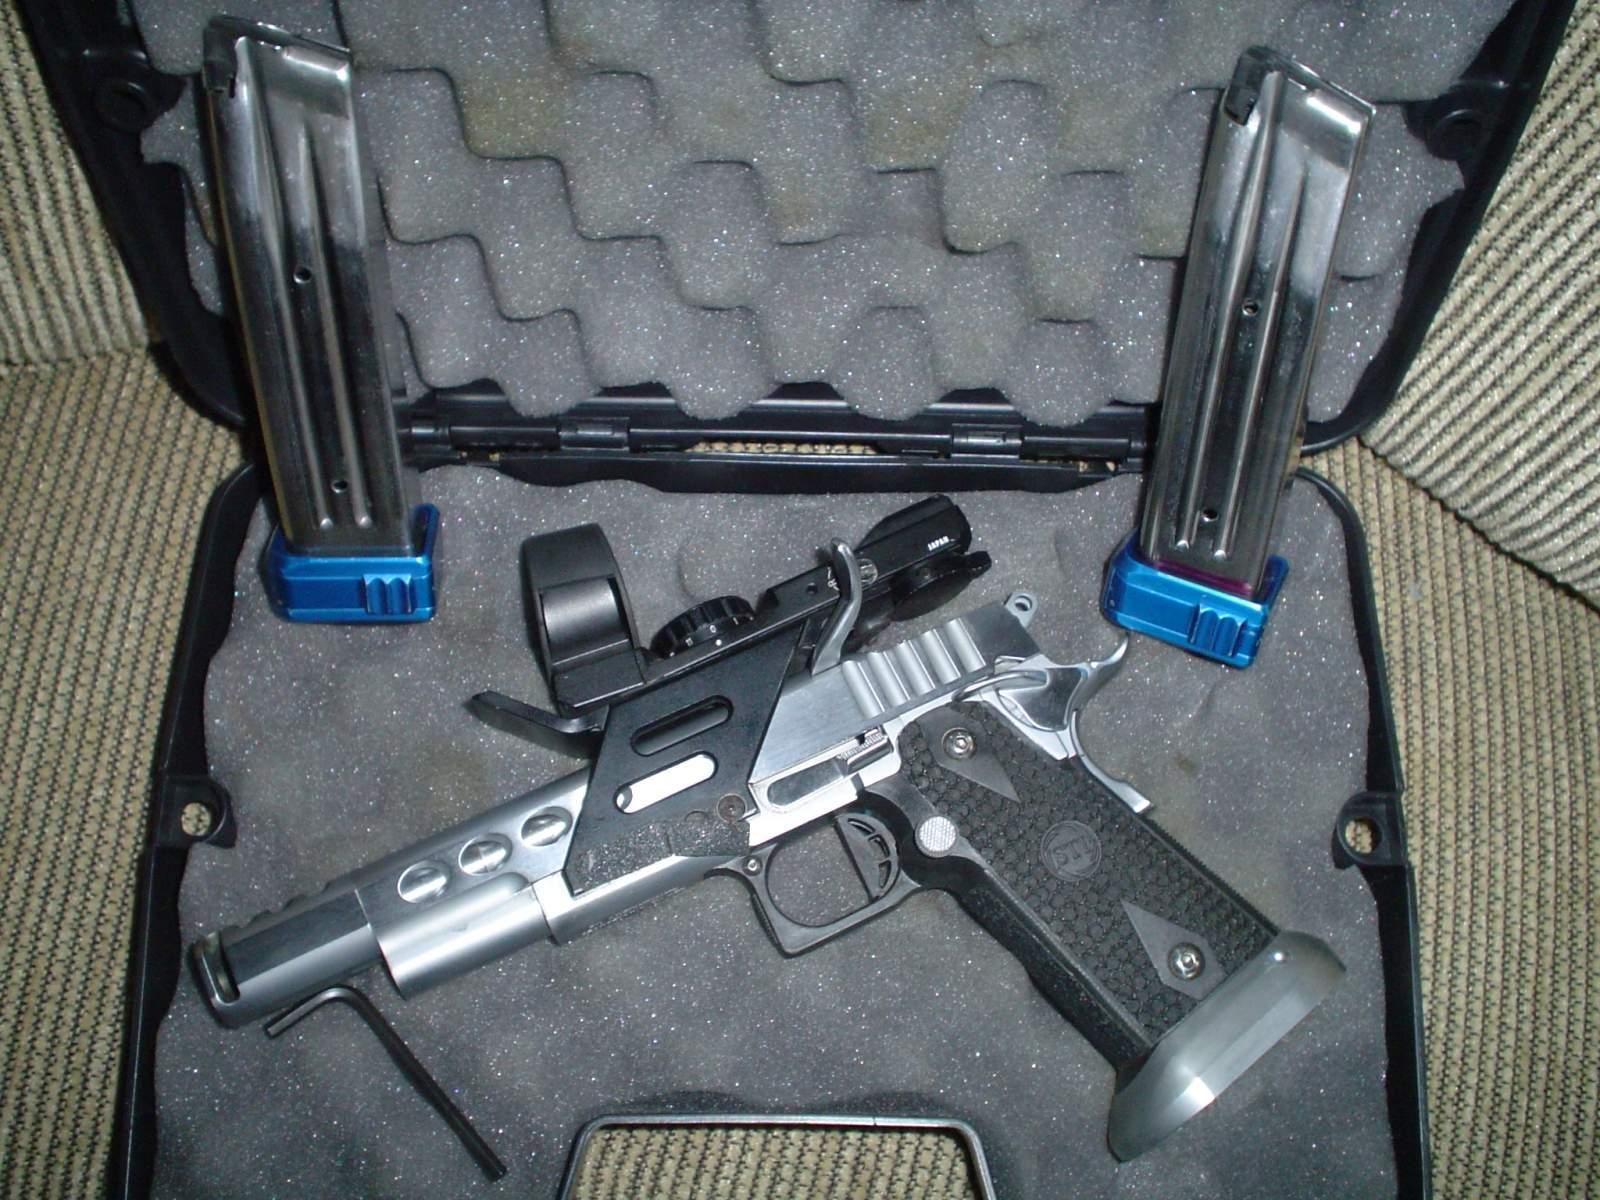 Race-gun 003.